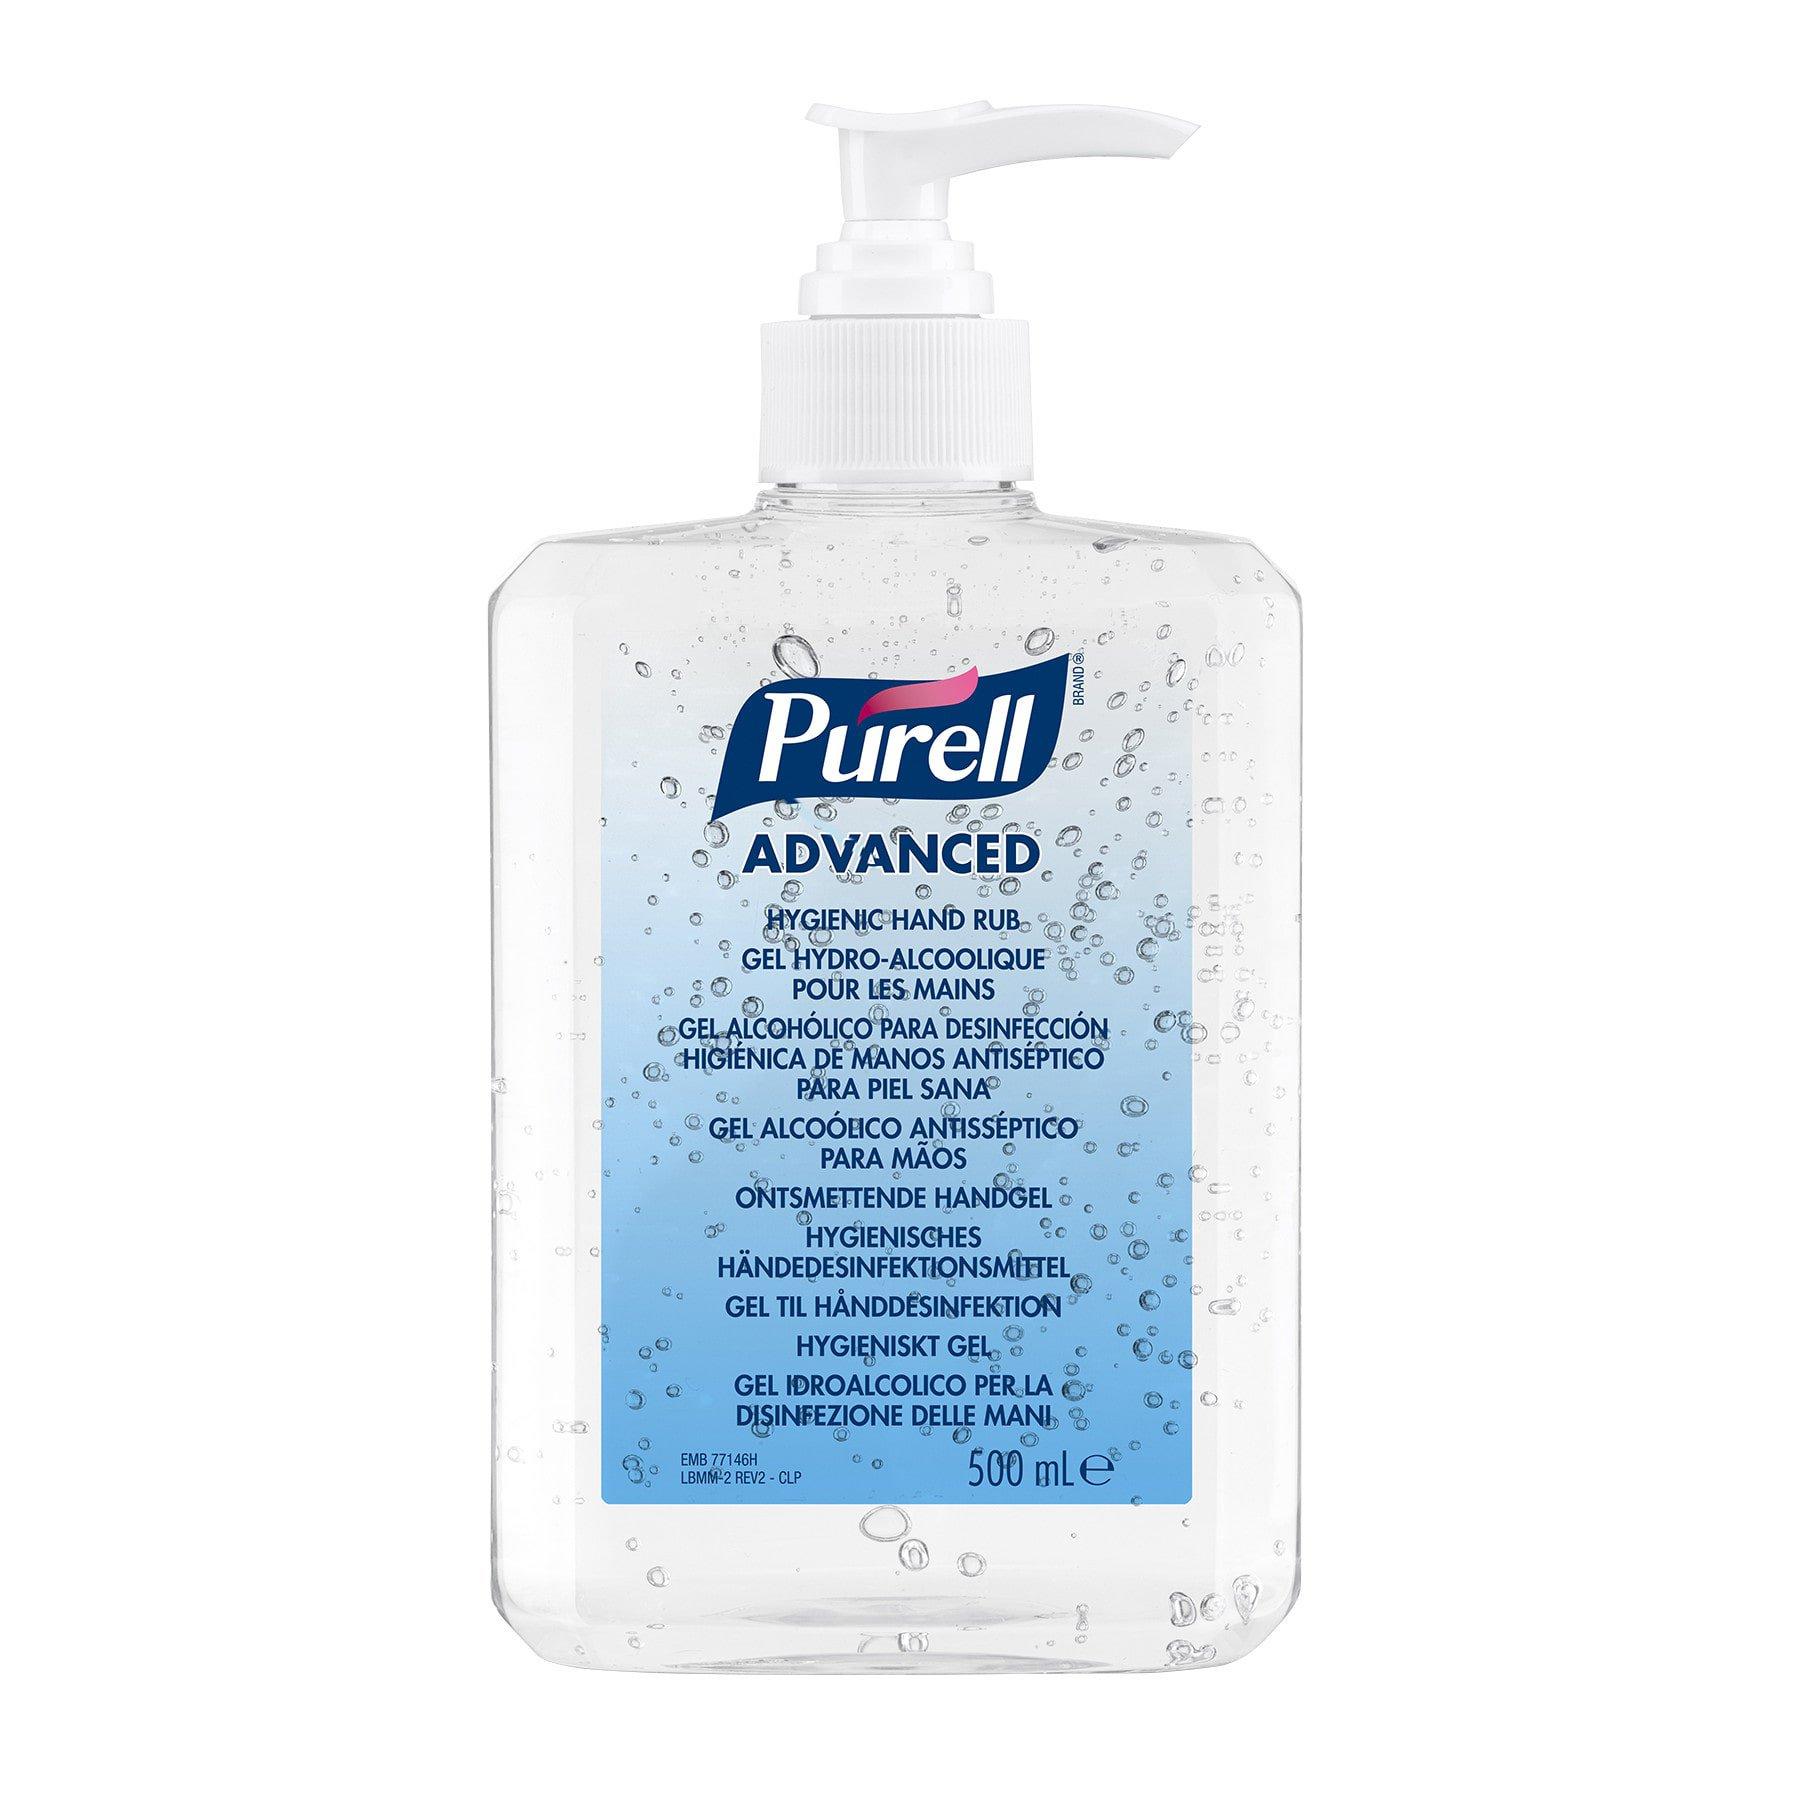 Gojo Purell Advanced desinfecterende handgel 12 x 500 ml